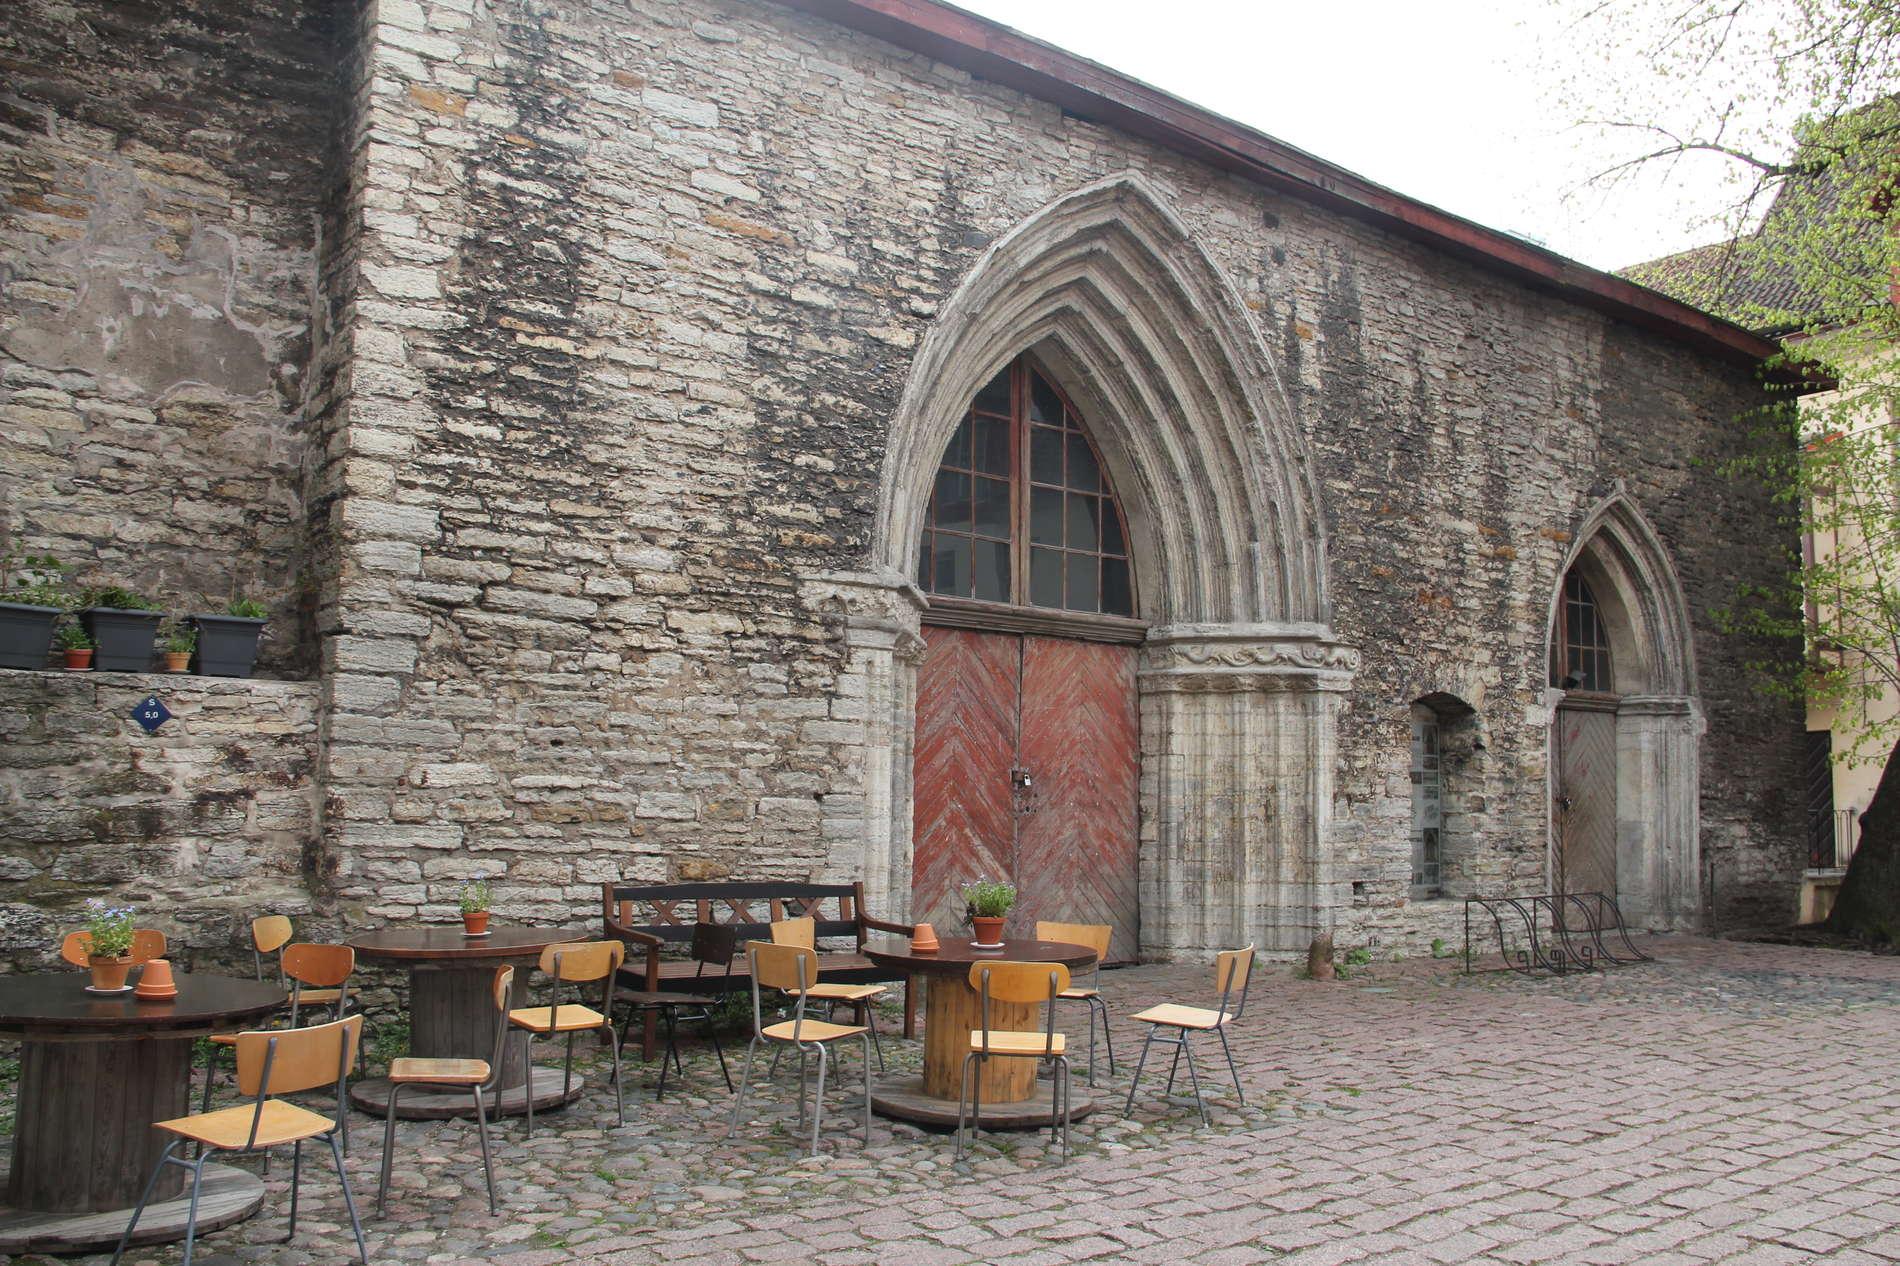 Saint Catherine's Church - välis